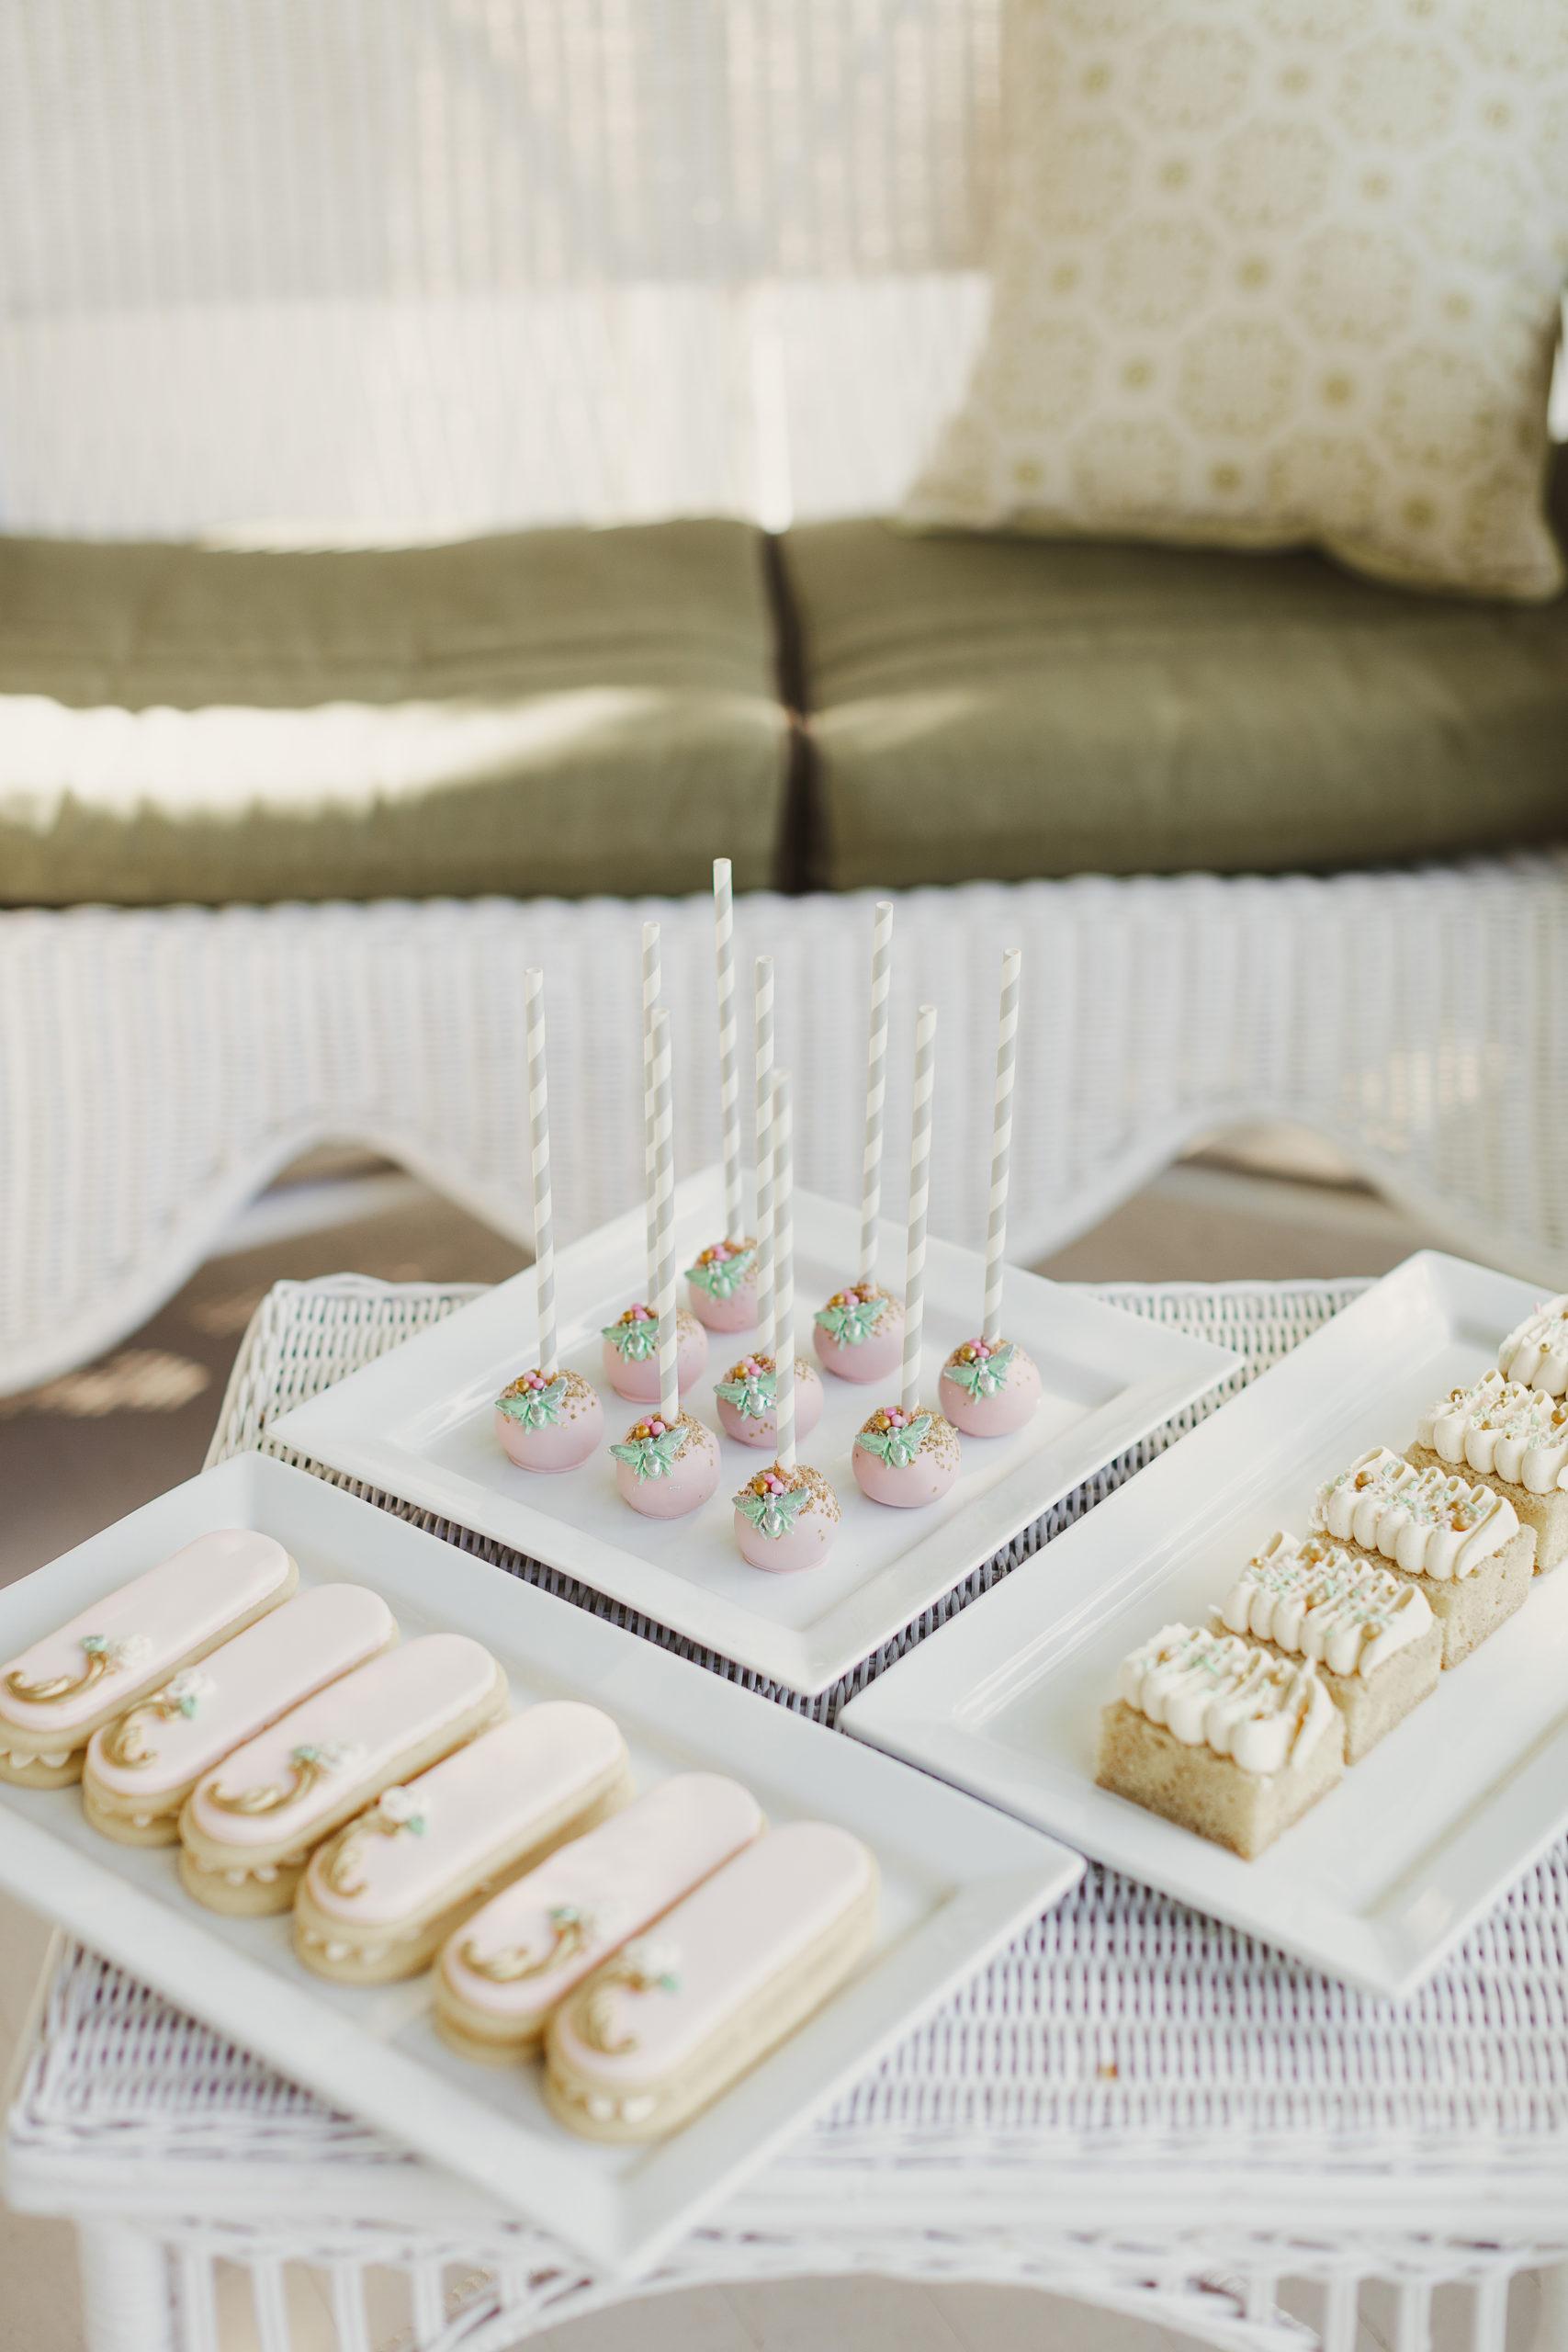 sweet avenue cakery desserts niagara